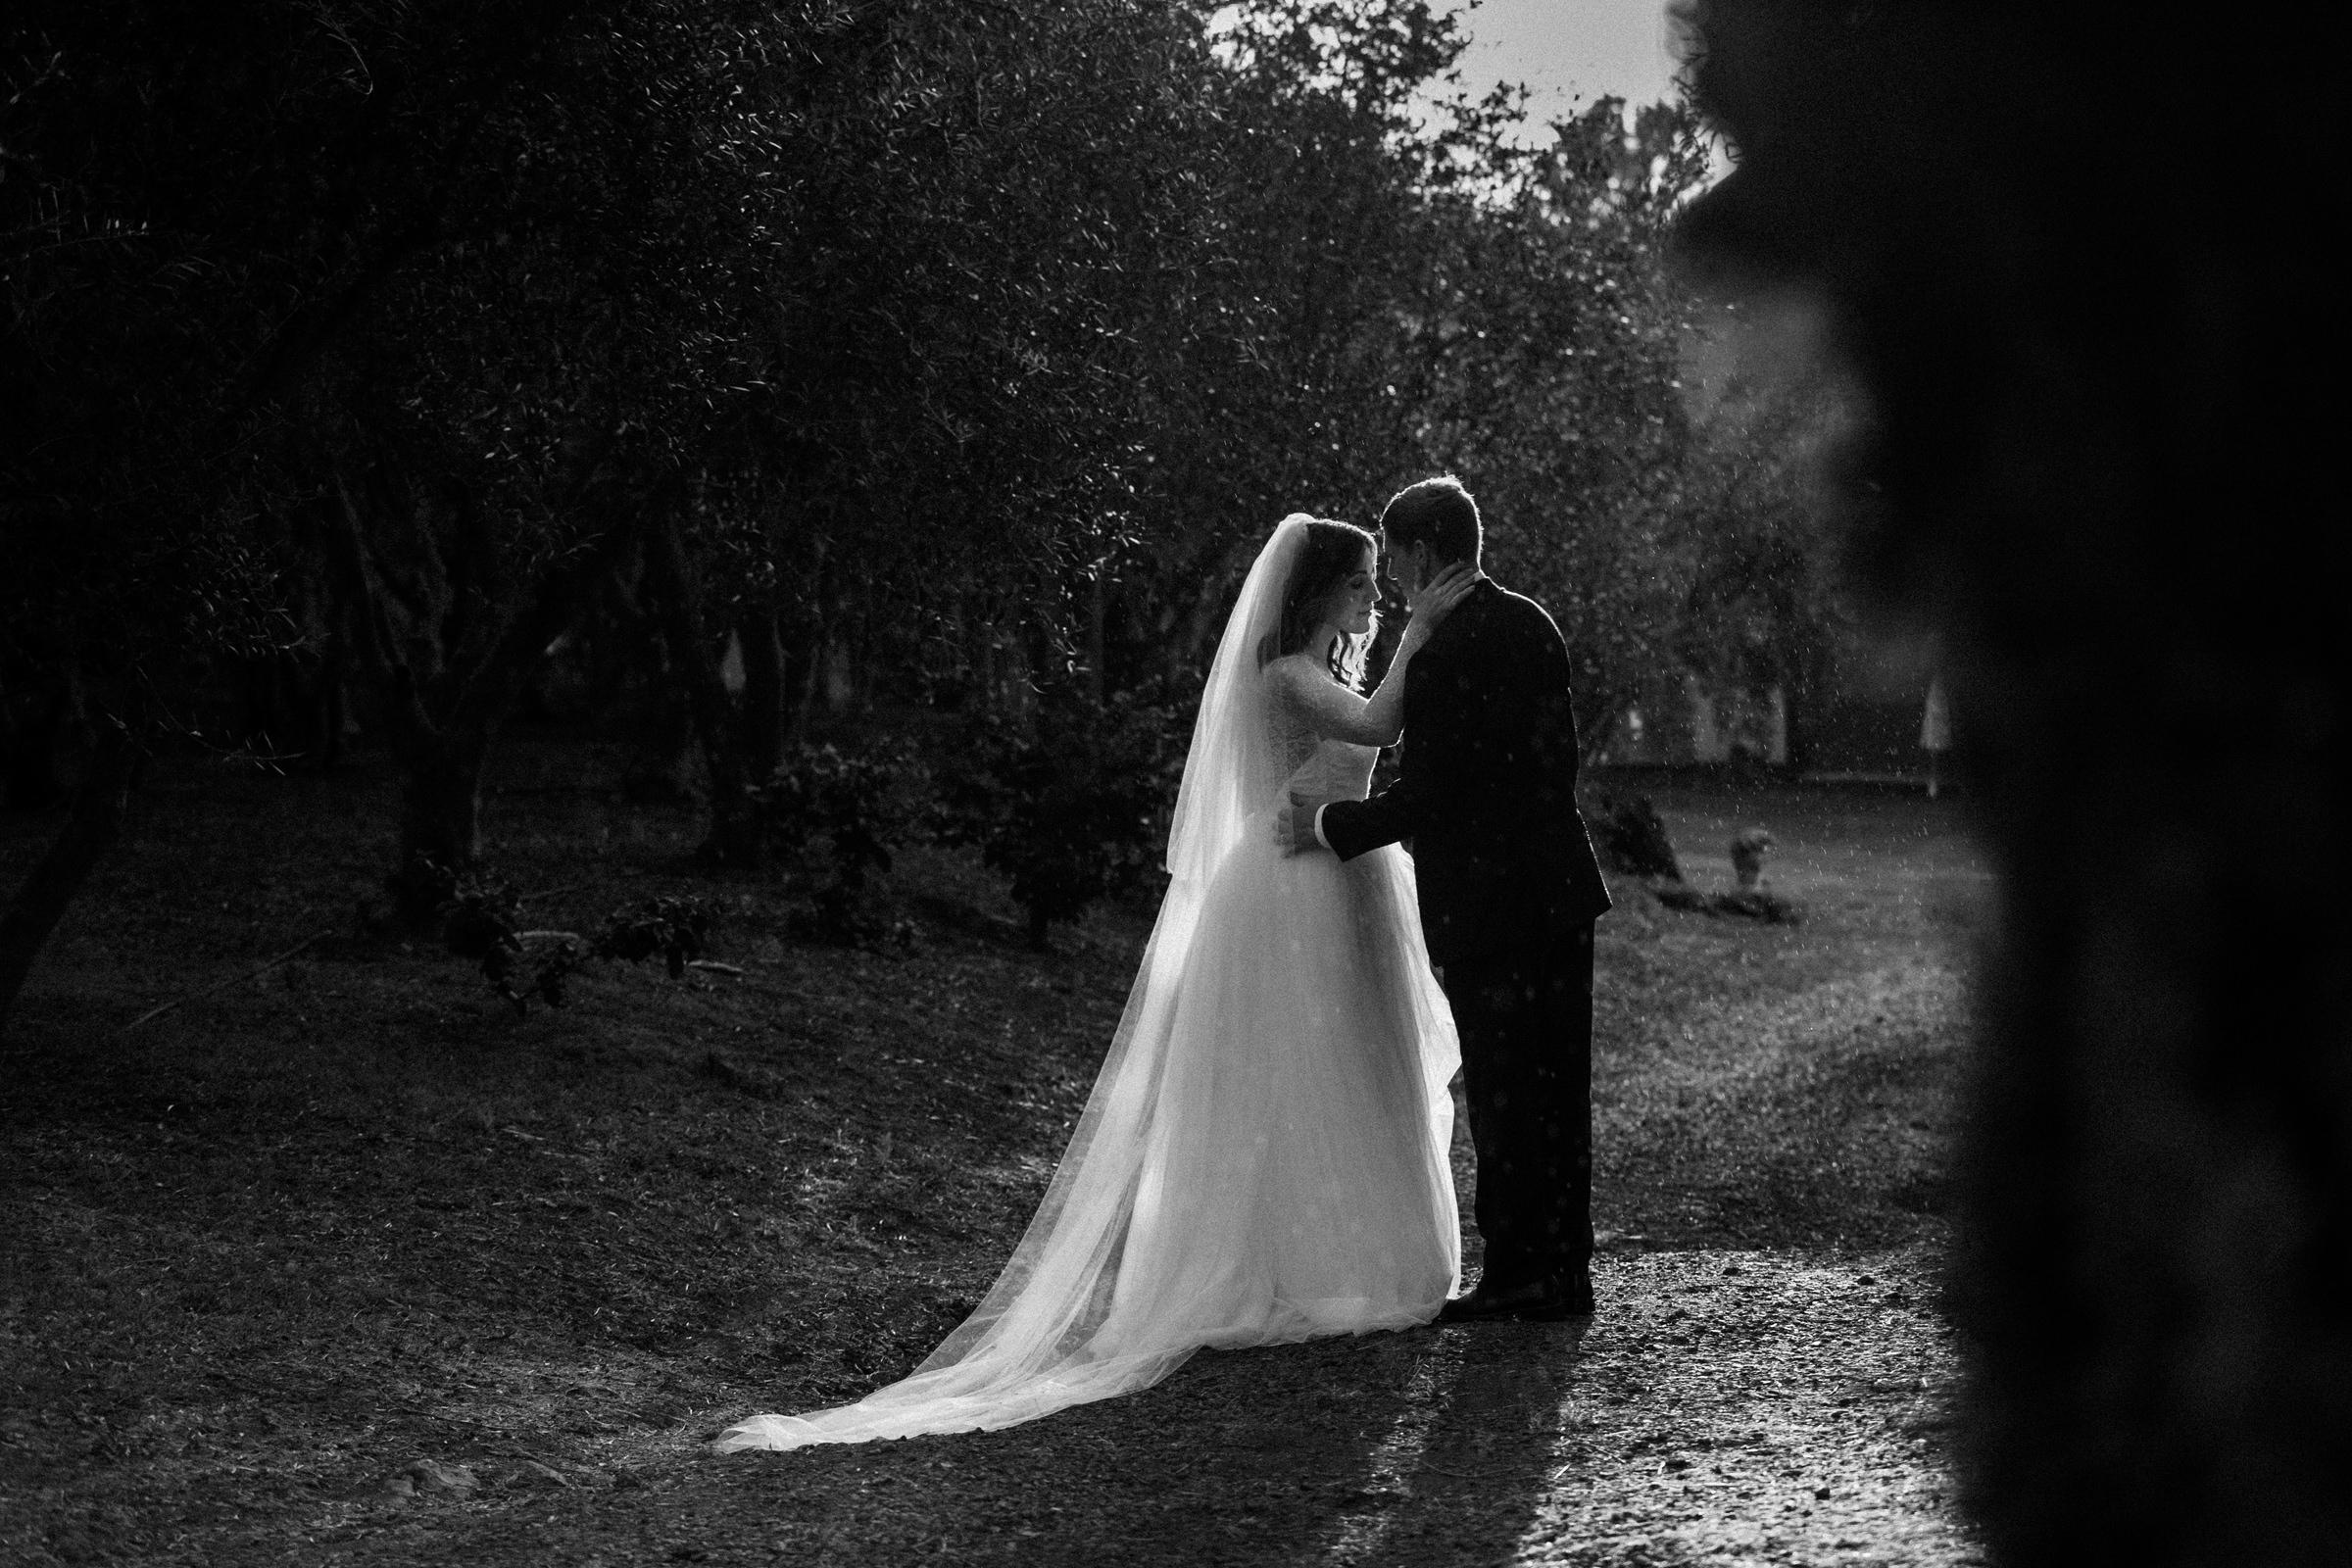 Calasa olive farm maui touching portrait of couple touching - photo by Melia Lucida